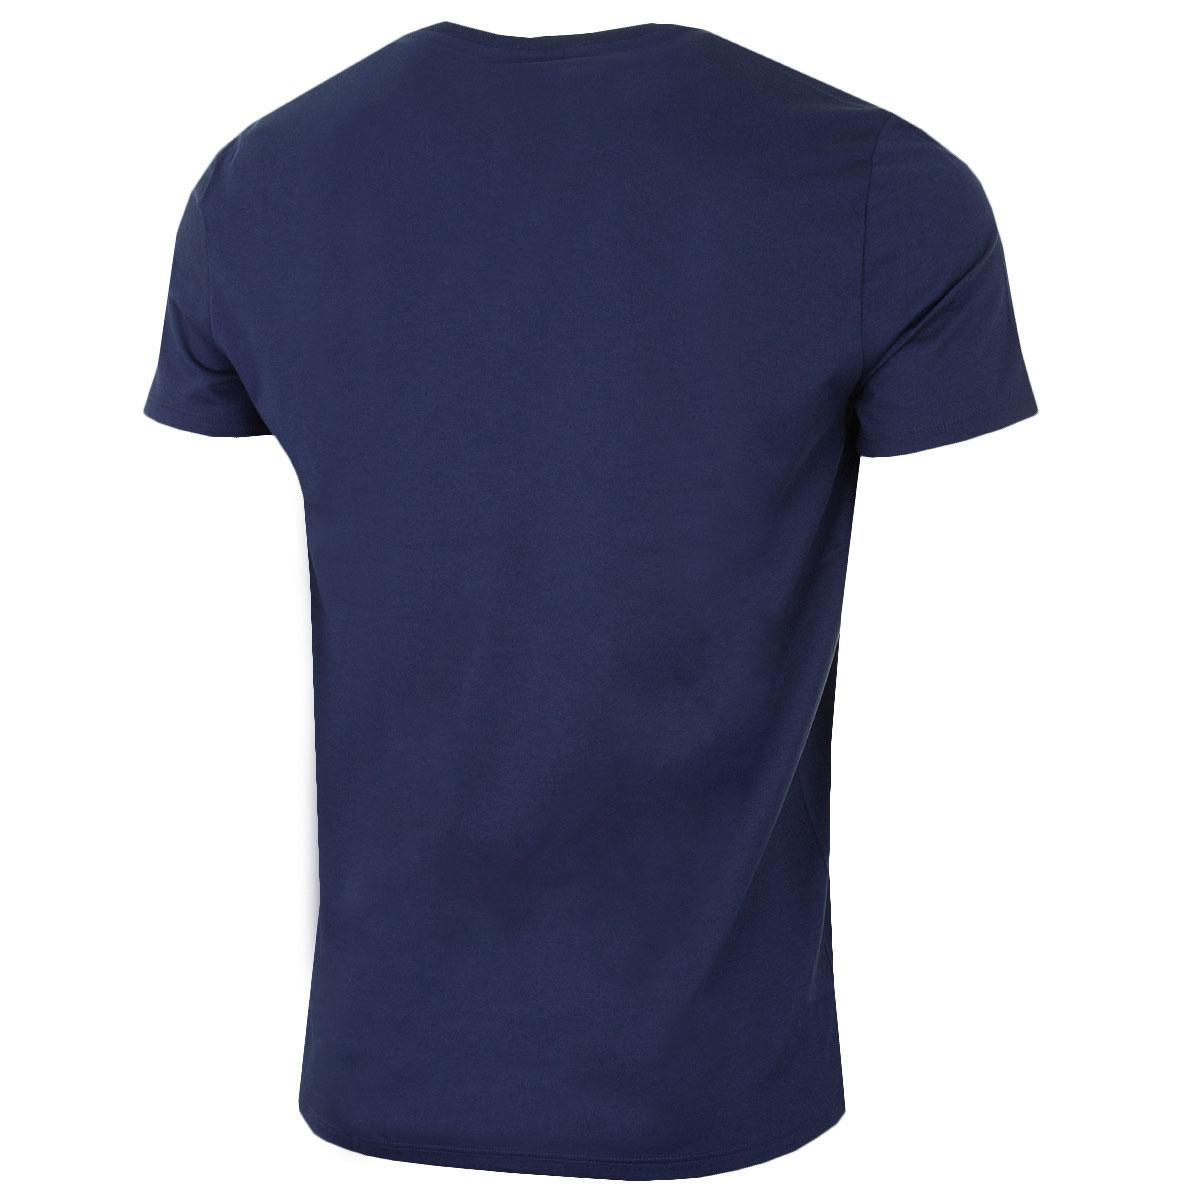 Lacoste-Mens-2019-SS-V-Neck-TH6710-Short-Sleeve-Pima-Cotton-Tee-T-Shirt thumbnail 16